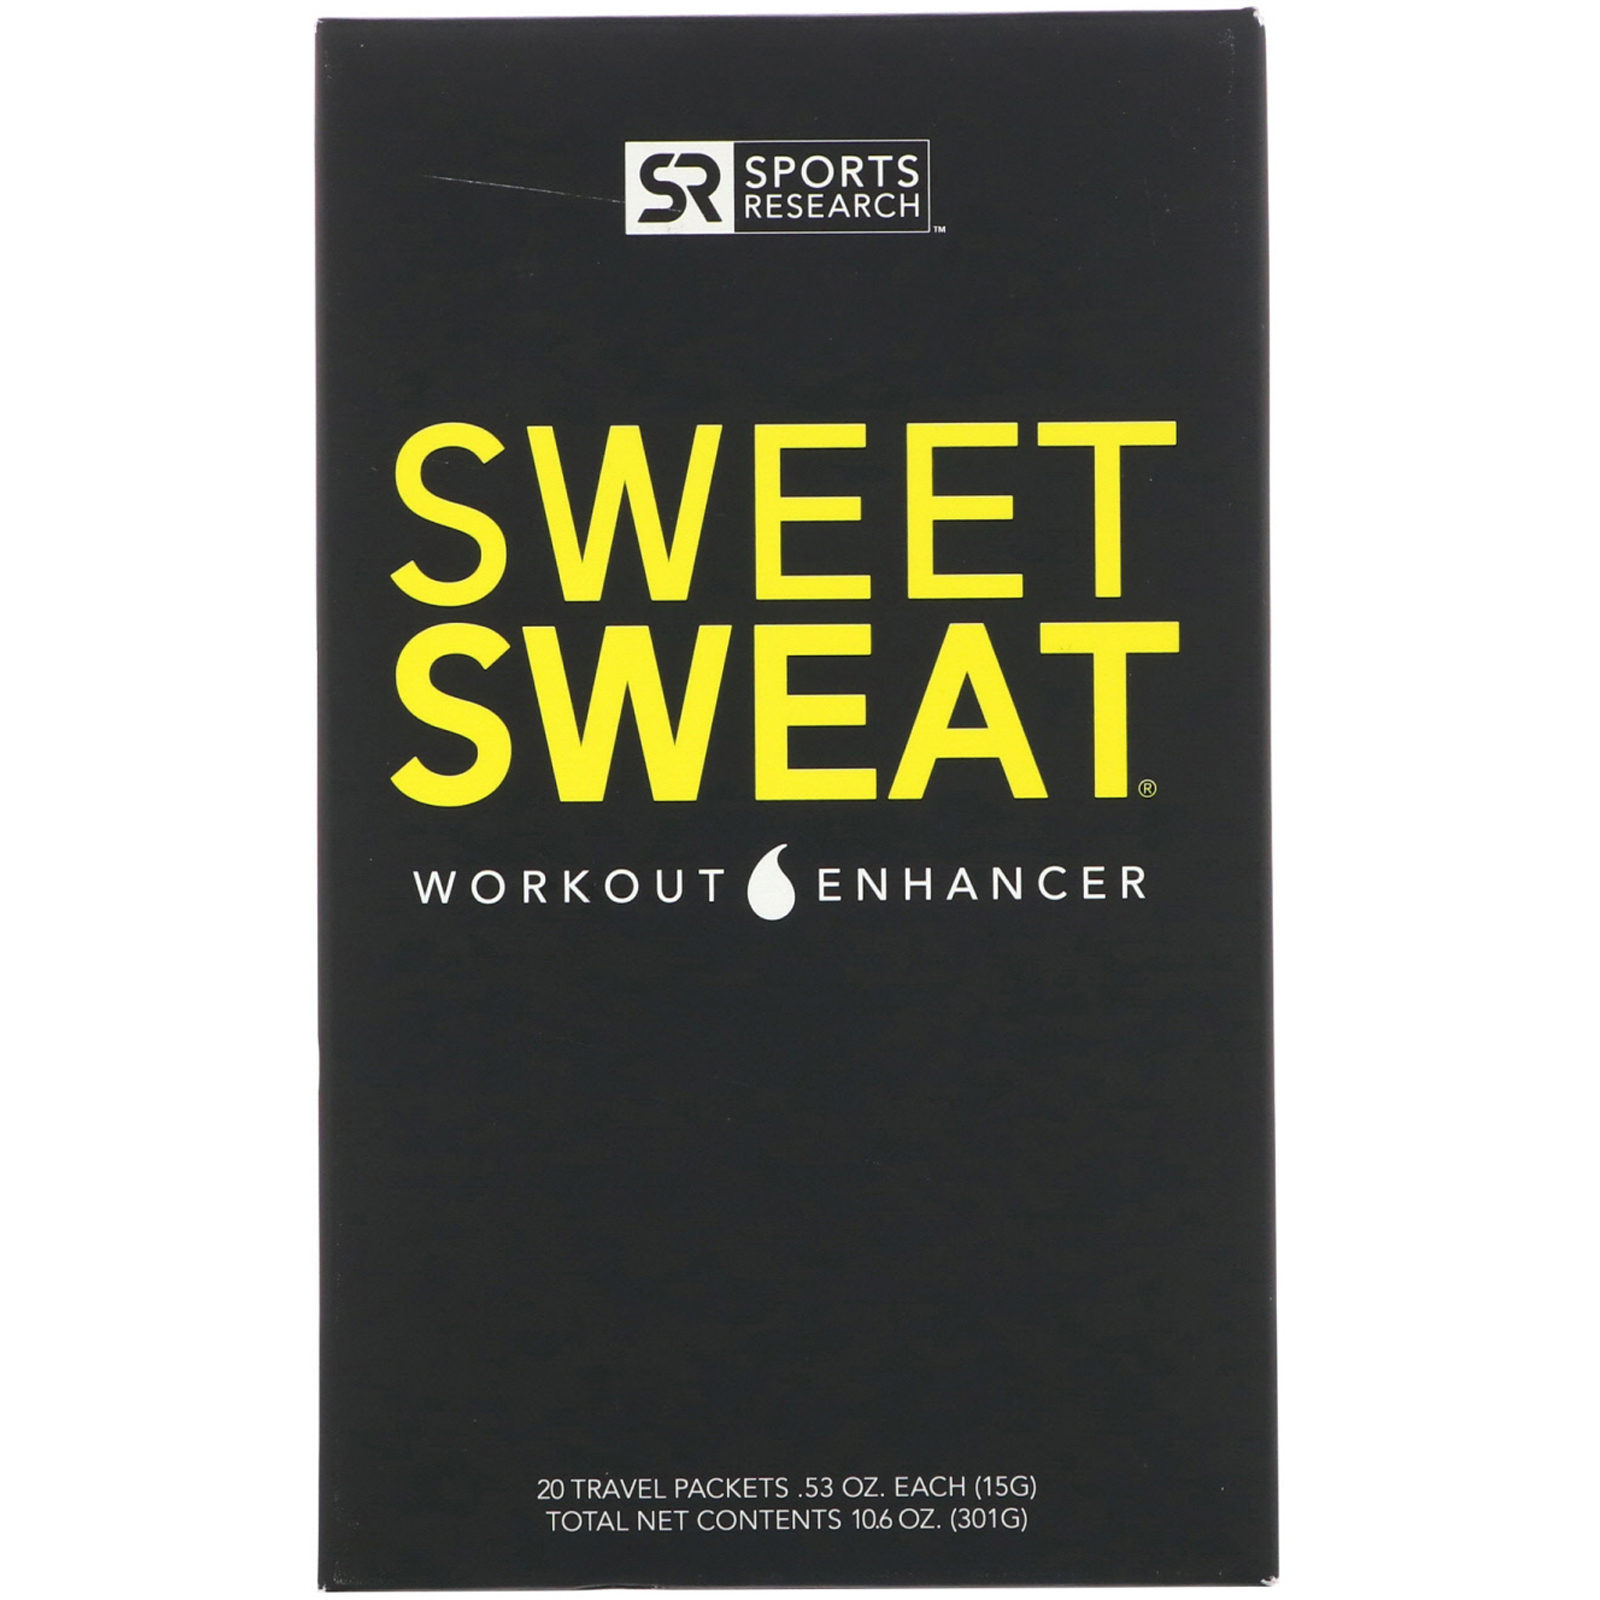 Мазь Sweet Sweаt Gym Packet Box (20 упаковок по 15 гр.) для снижения и контроля веса